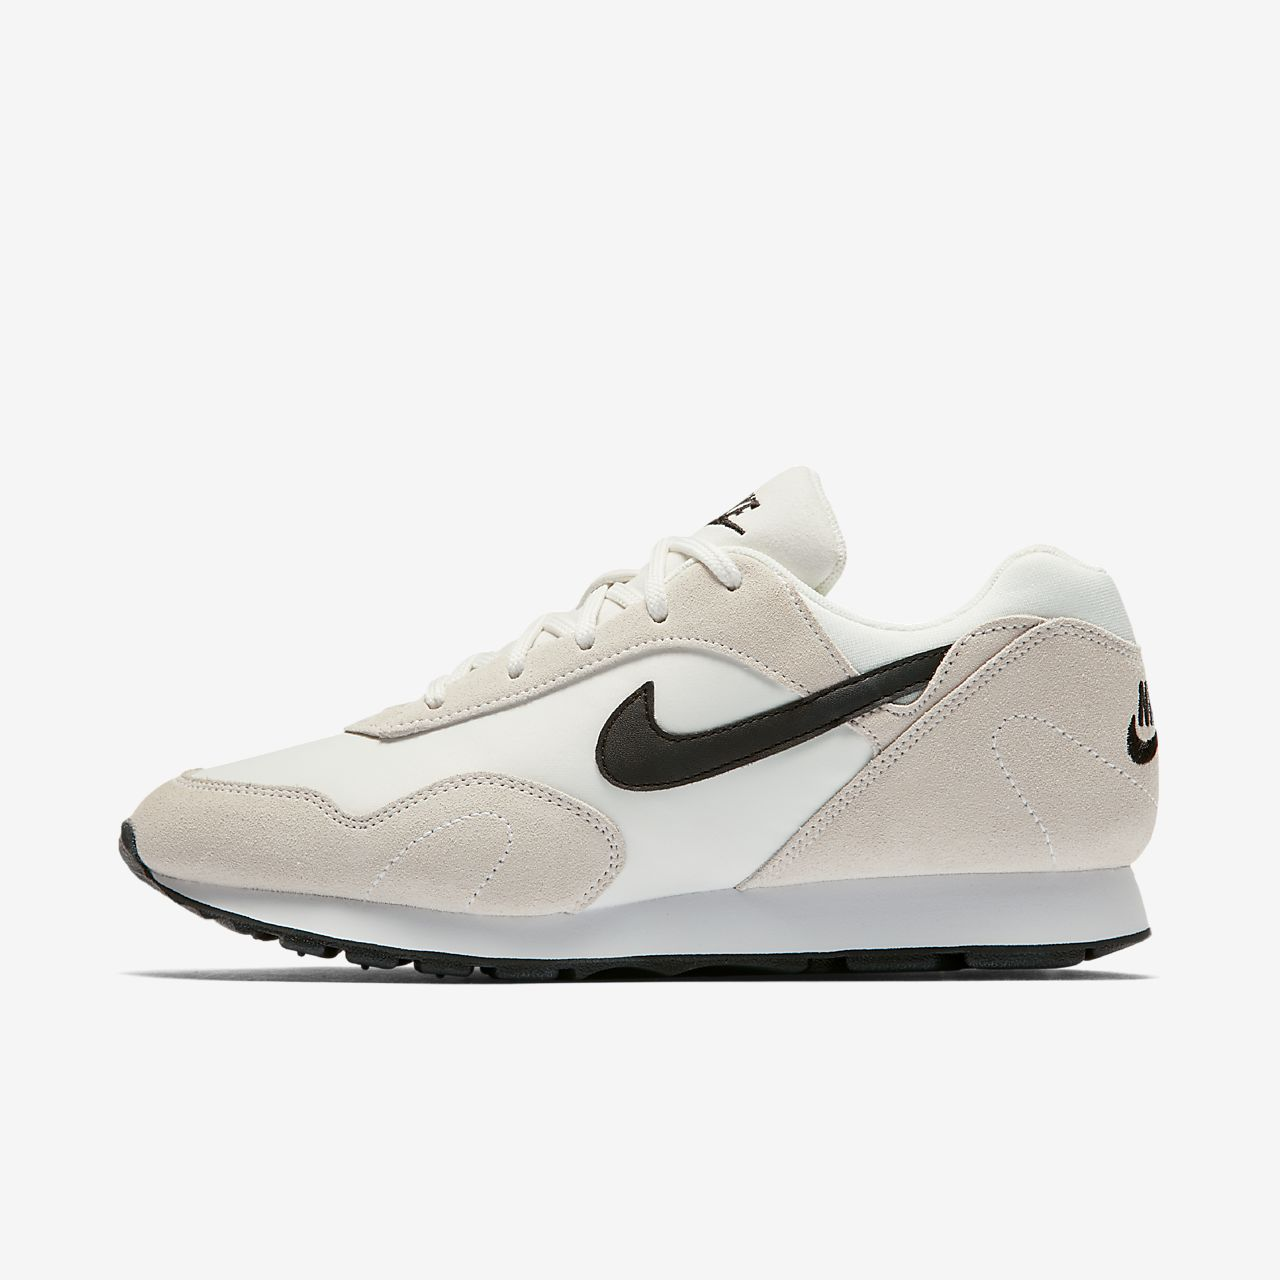 61ba97d3b992f Nike Outburst Women's Shoe. Nike.com LU